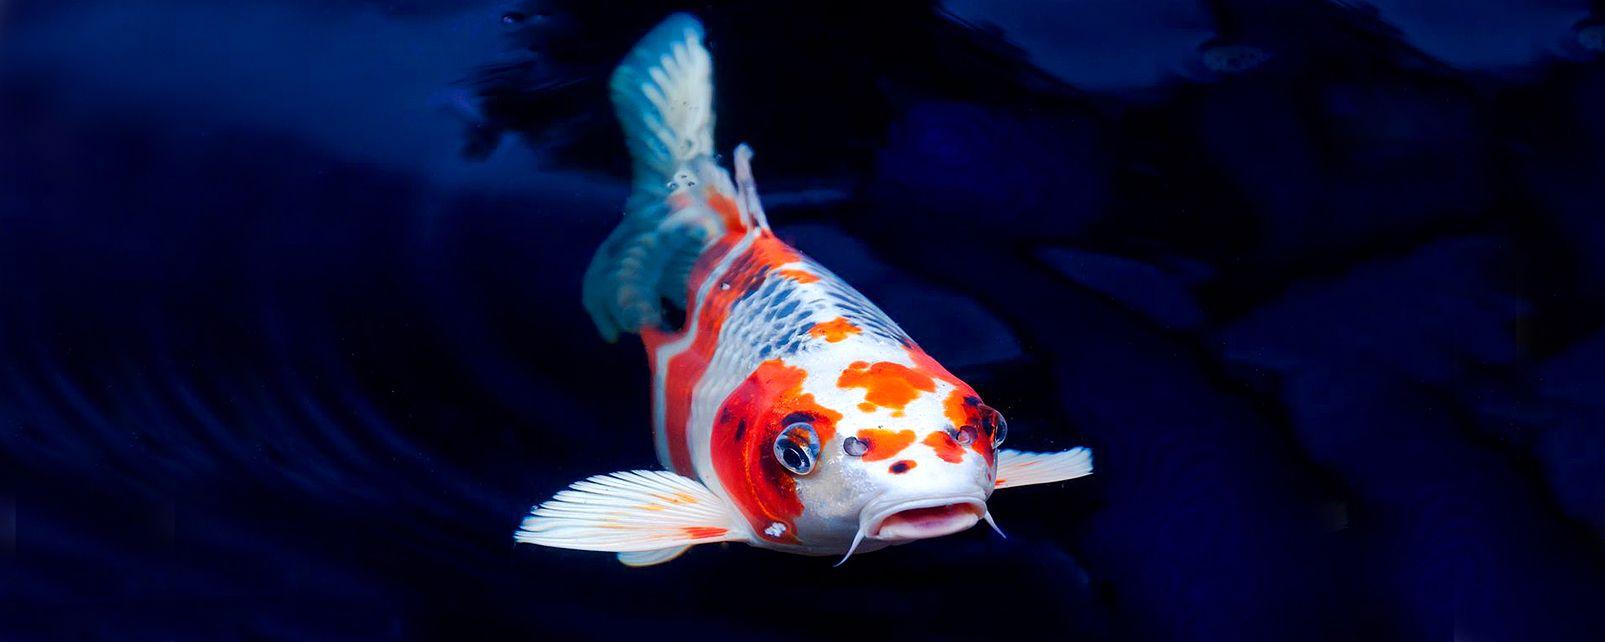 La faune et la flore, Asie Taiwan Taïwan faune animal faune aquatique carpe